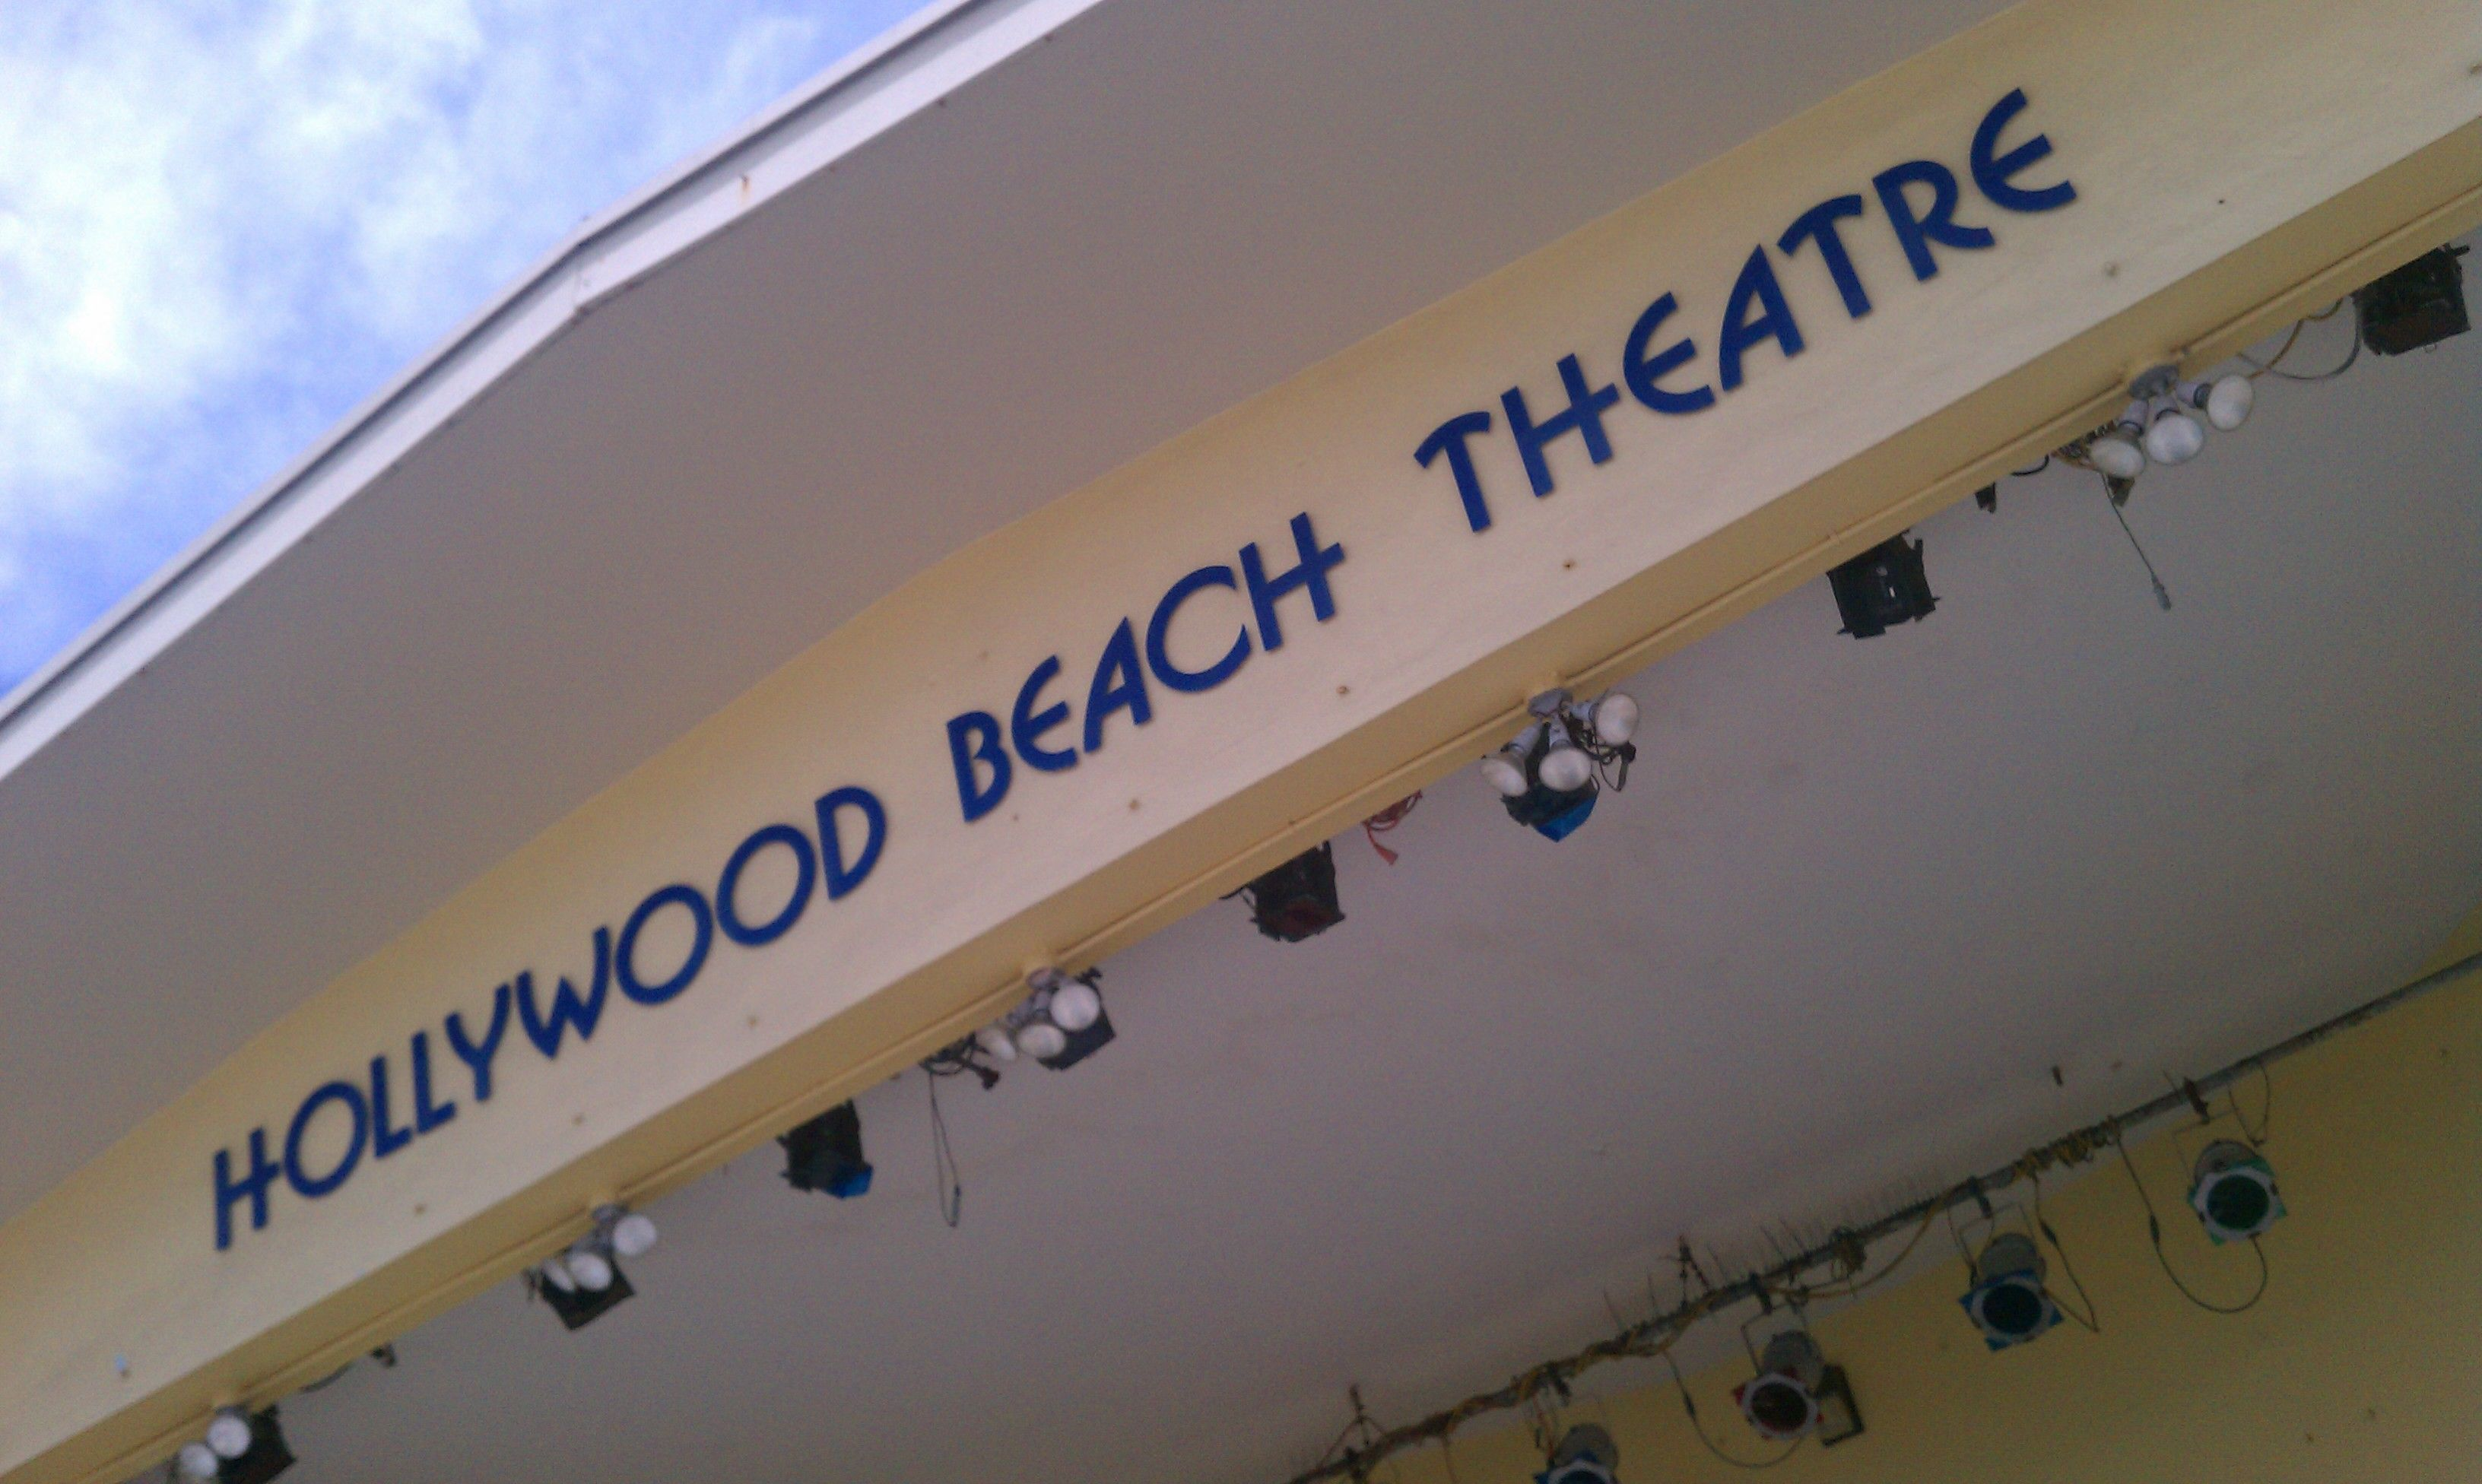 Hollywood beach theatre florida